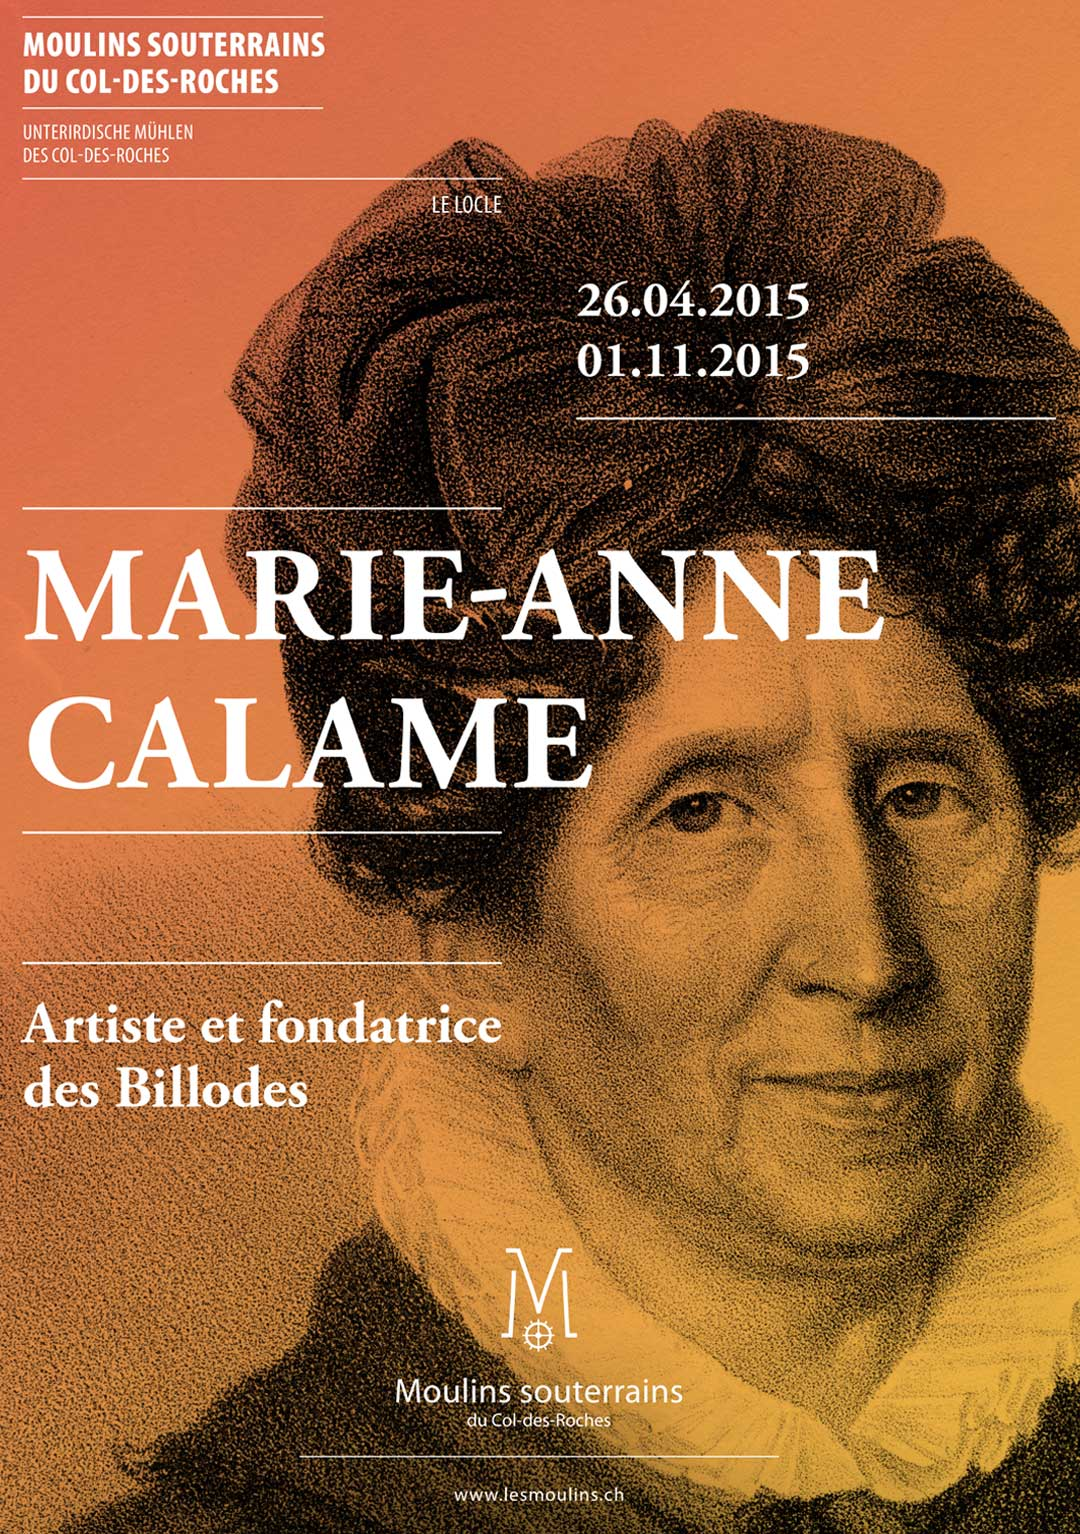 Marie-Anne Calame (1775-1834) : artiste et fondatrice des Billodes